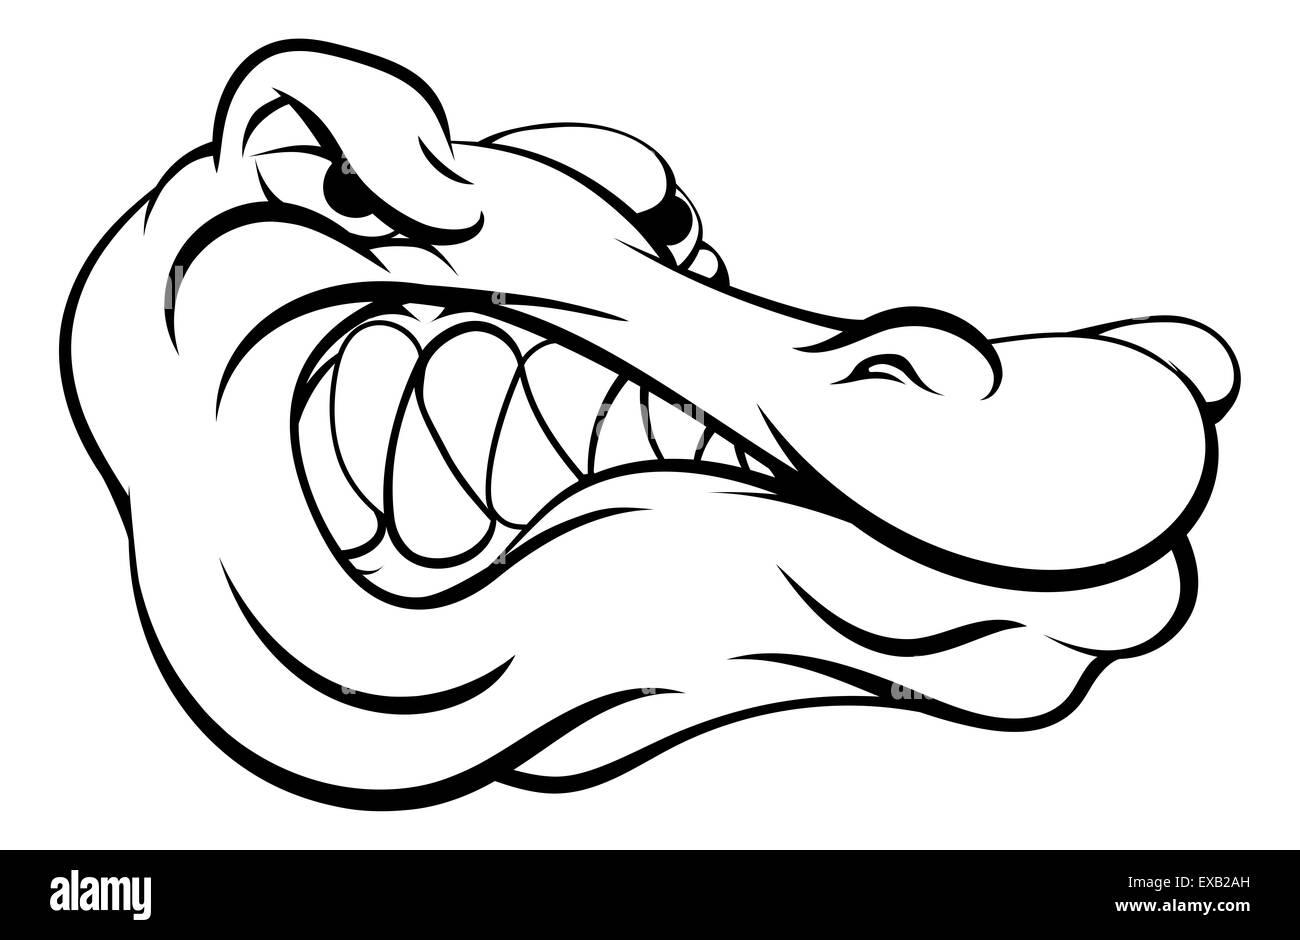 crocodile alligator cartoon character head stock photos crocodile